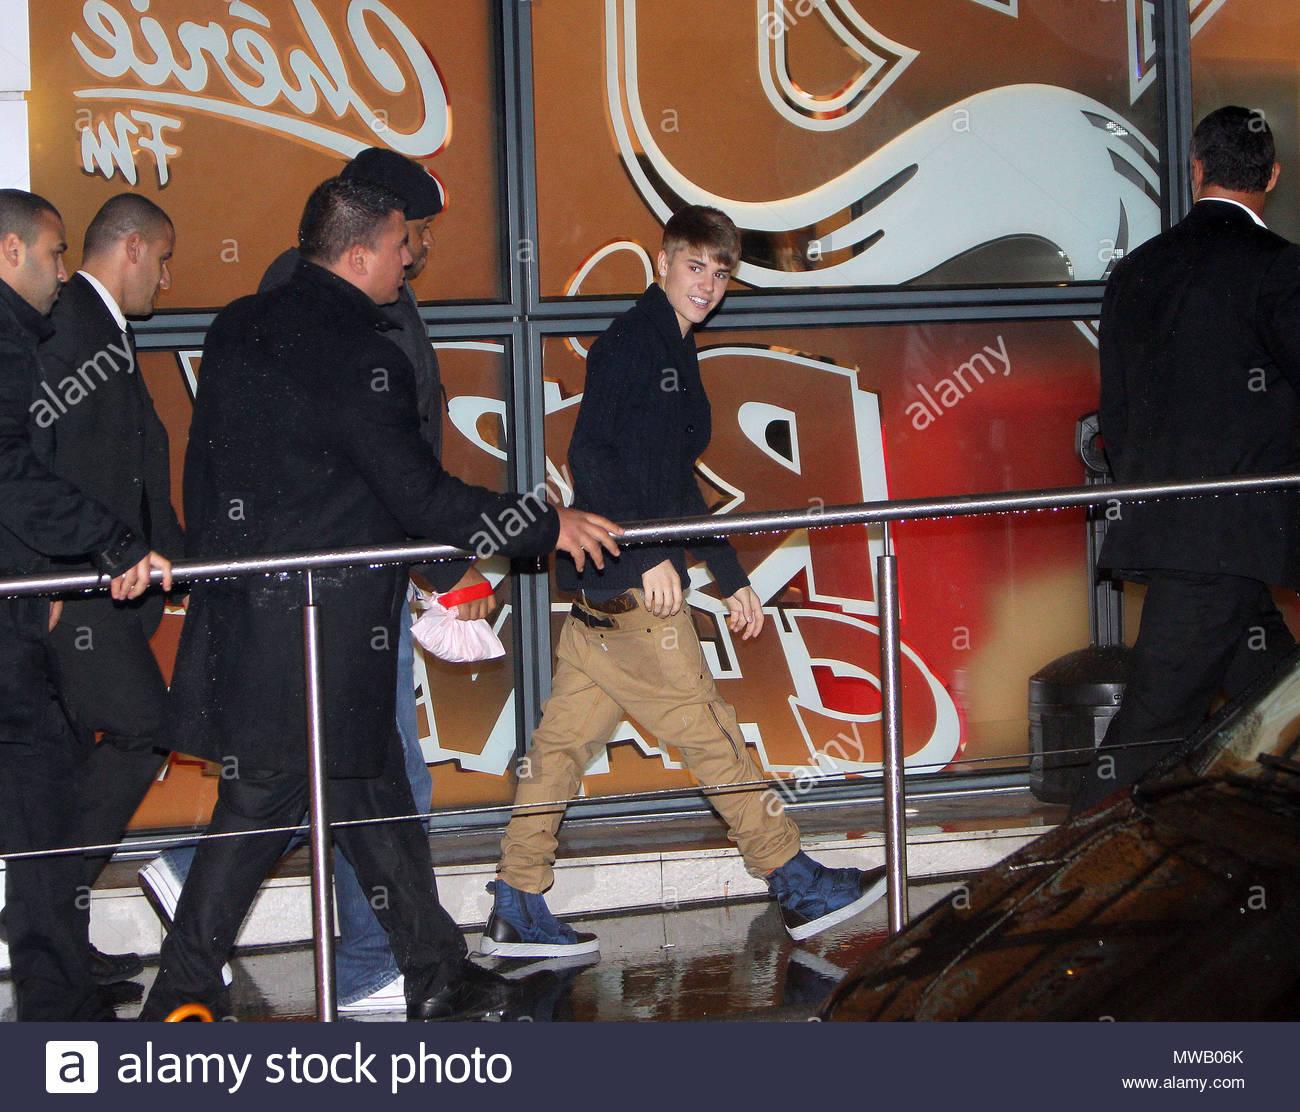 Justin Bieber. Justin Bieber and Selena Gomez arriving at NRJ radio ...